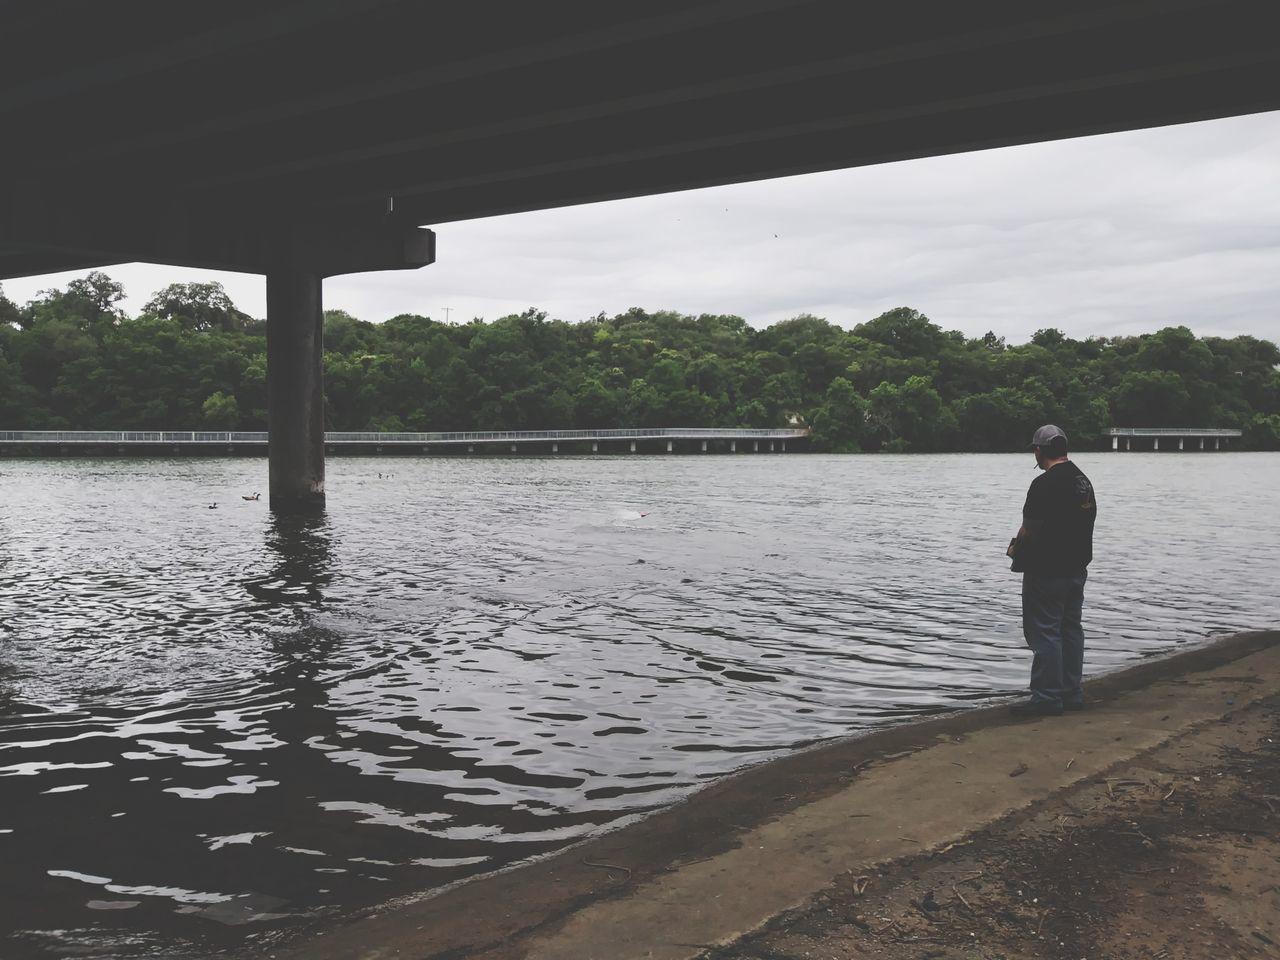 The Street Photographer - 2017 EyeEm Awards One Man Only Full Length Bridge - Man Made Structure Austin Texas Festival Beach Ladybird Lake A Man And His Toys Rc Boat Hobbies Under A Bridge RC Underpass